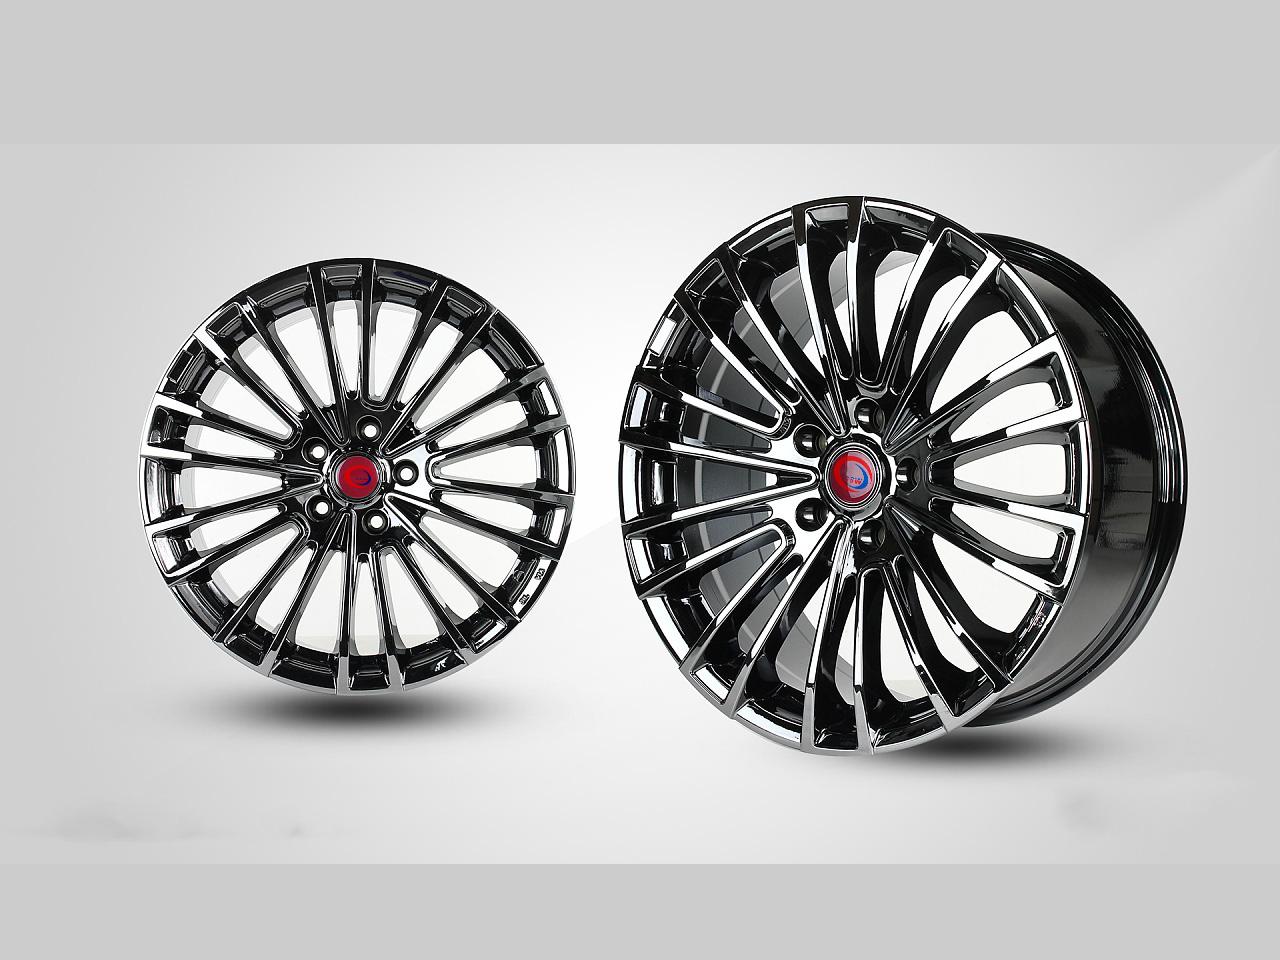 16-28 inches wheels aluminum alloy wheels a-series